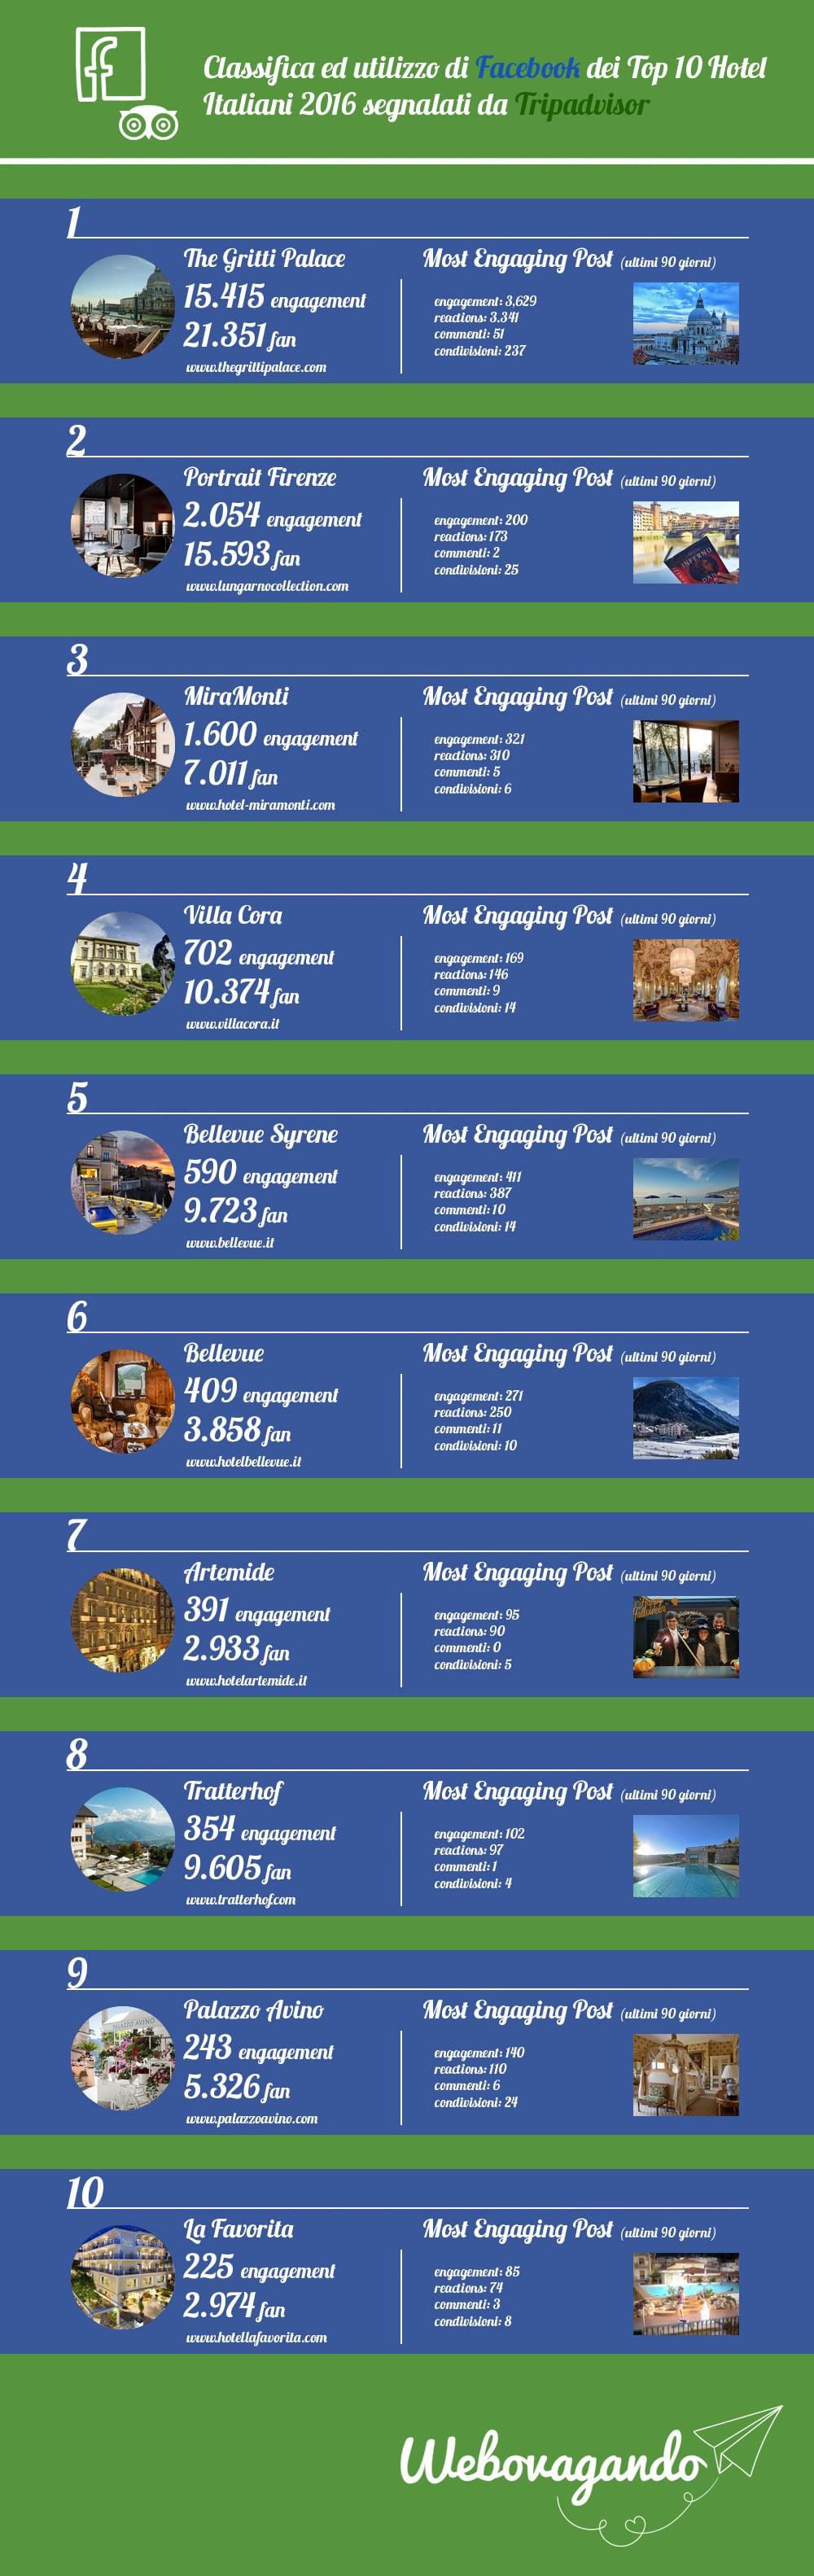 infografica_tripadvisor_facebook_top_hotel_italiani